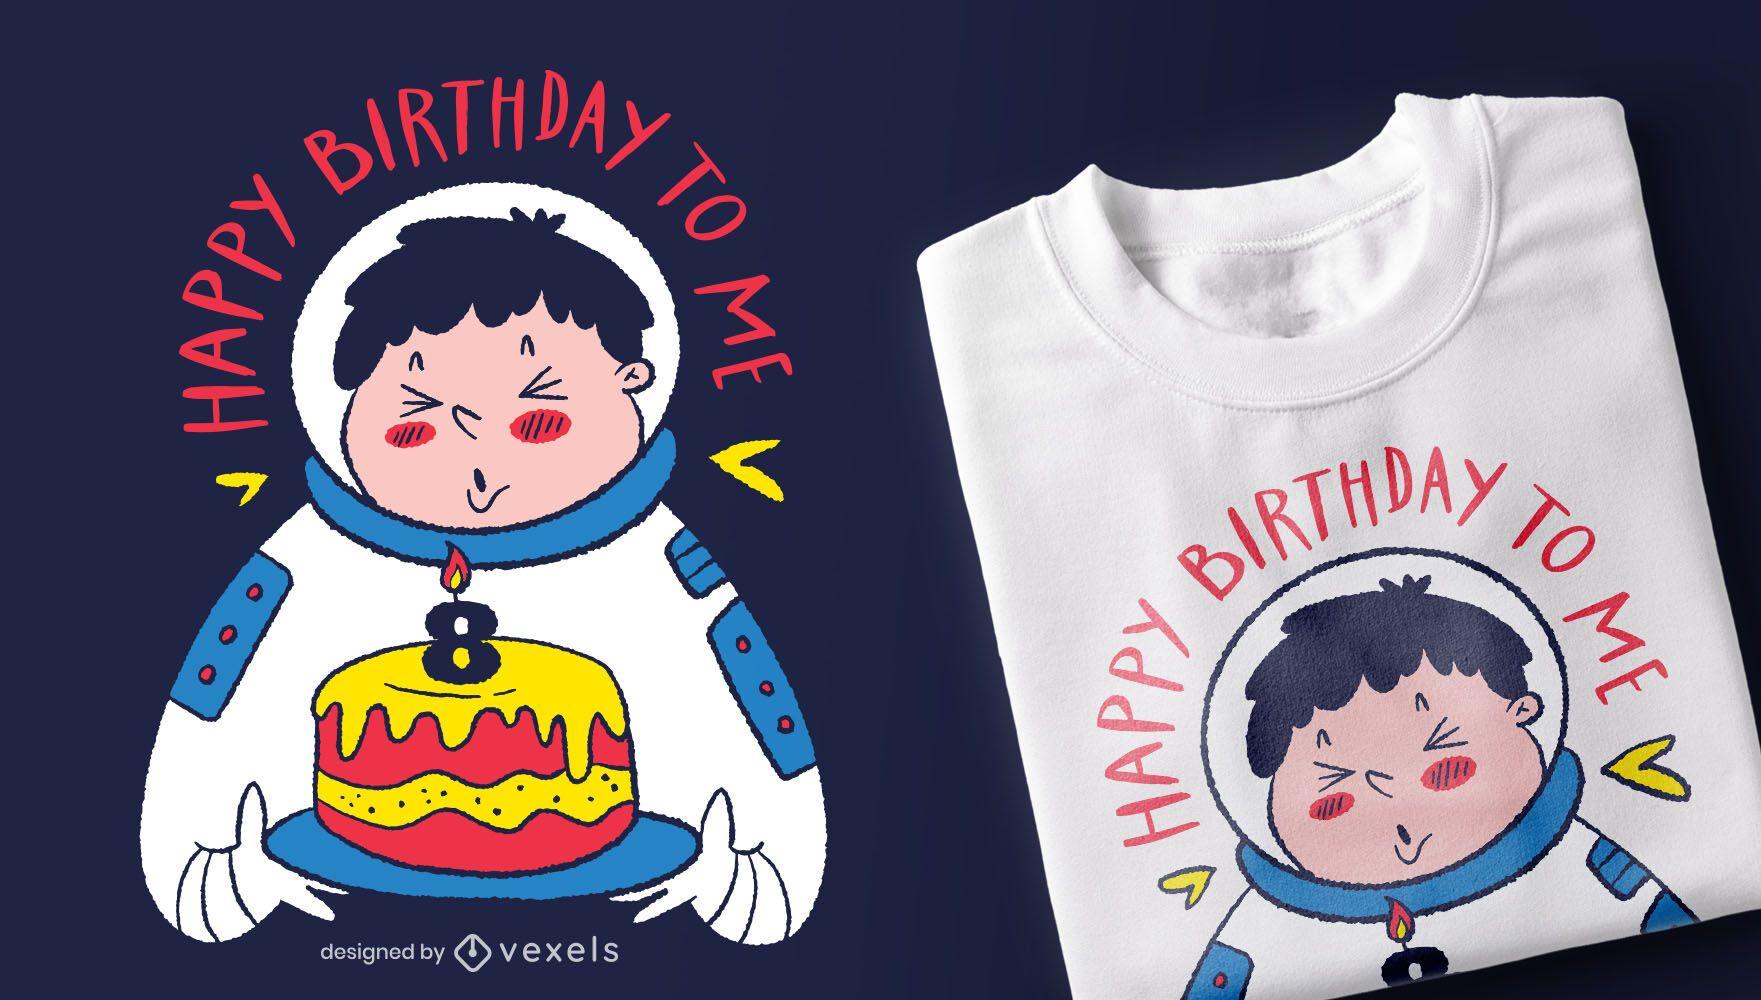 Birthday astronaut t-shirt design